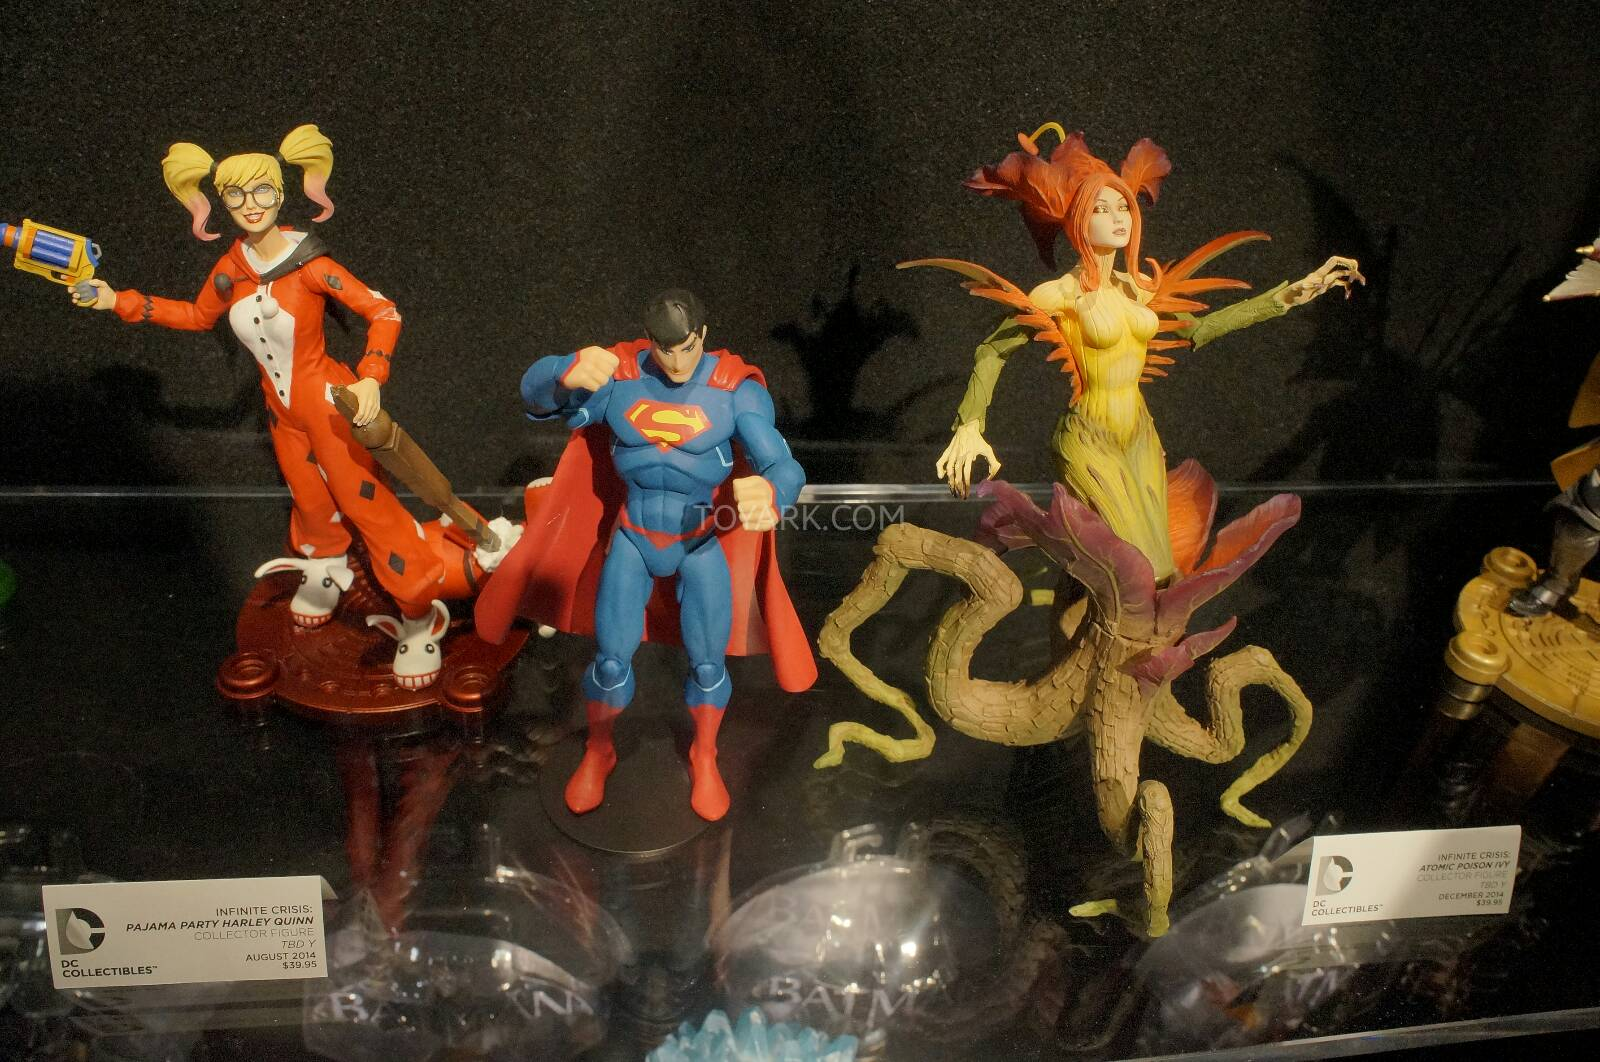 [Toy Fair 2014] DC Collectibles Toy-Fair-2014-DC-Collectibles-135